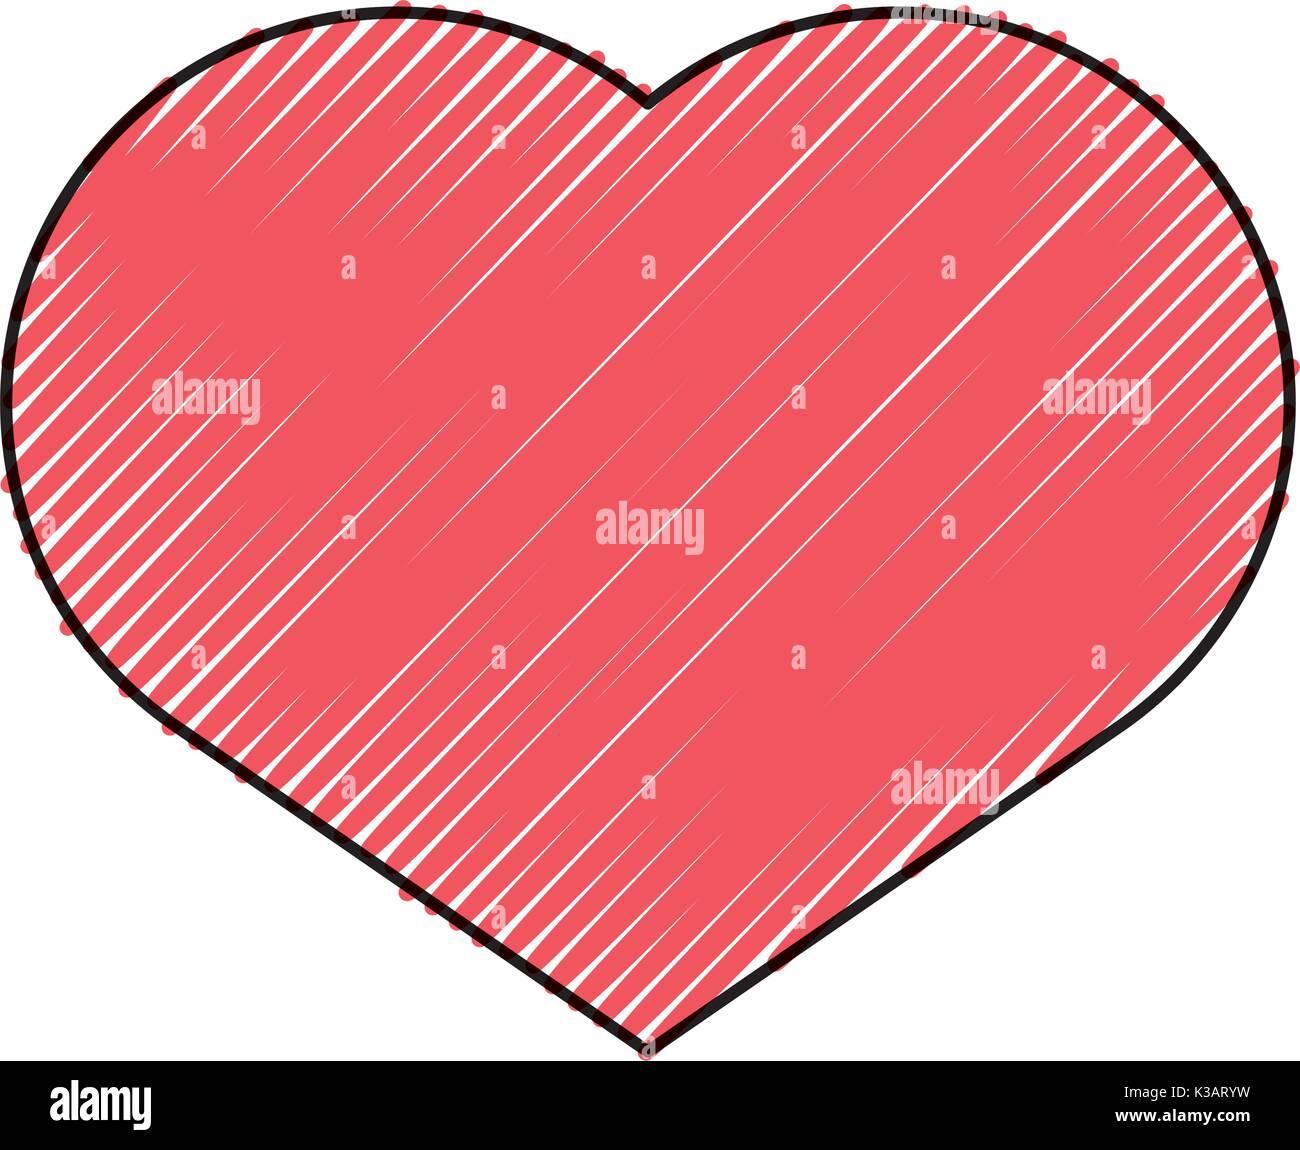 Herz-Form-Symbol Stockbild